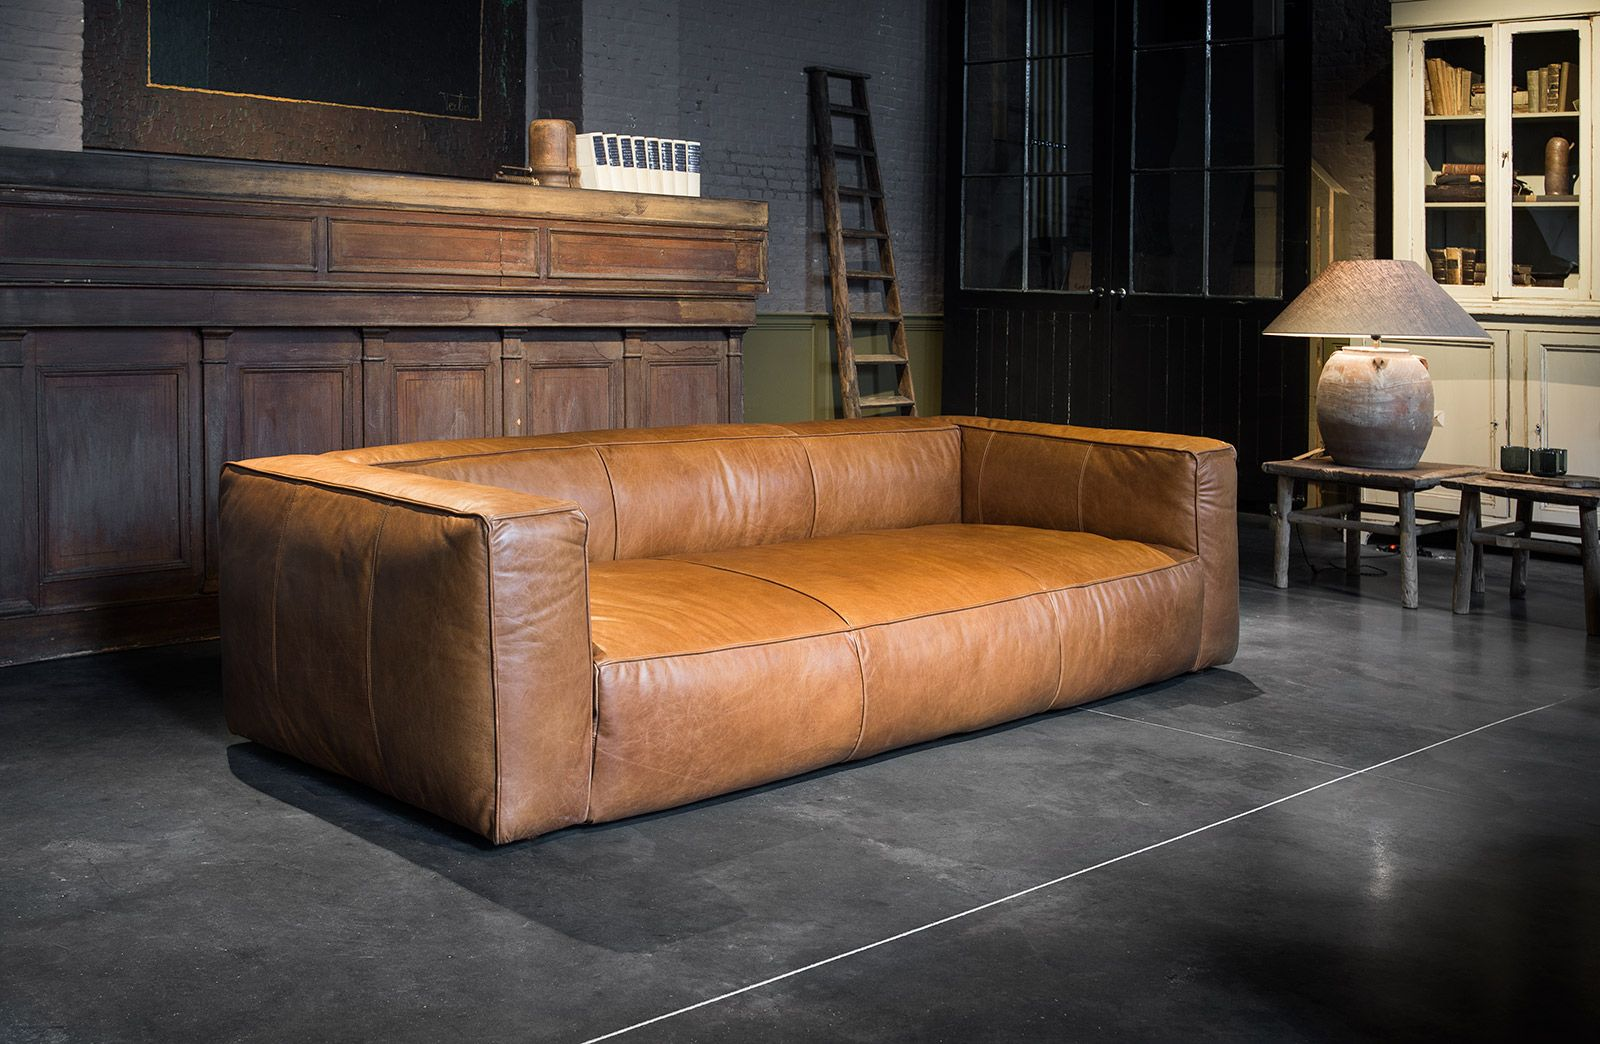 Full Size of Prime Quality Leather Three Seater Sofa In A Cognac Colour W Schillig Flexform Liege Freistil Kunstleder Weiß Xxl Grau Altes Goodlife Led Mit Holzfüßen Sofa Sofa Cognac